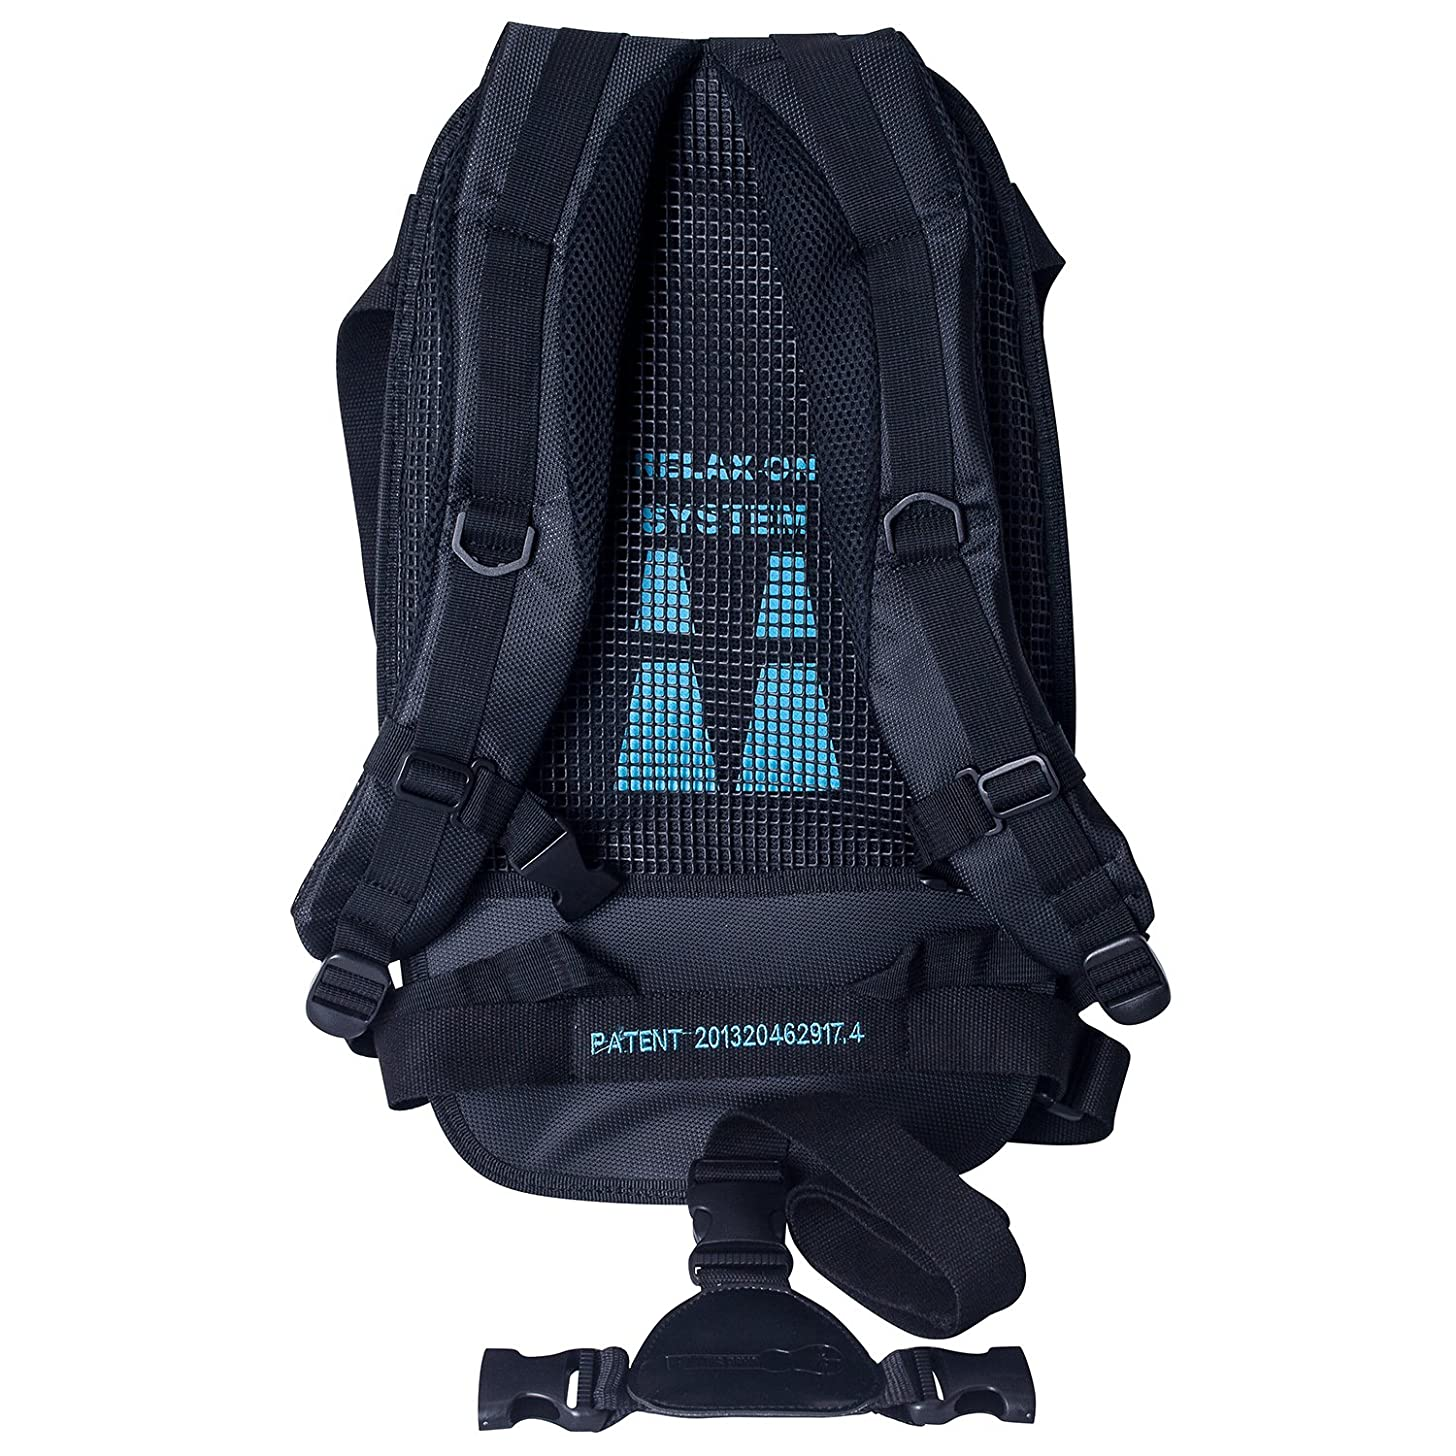 Crossrock CRCS1 Case Saddle for Hard Guitar Case as backpack